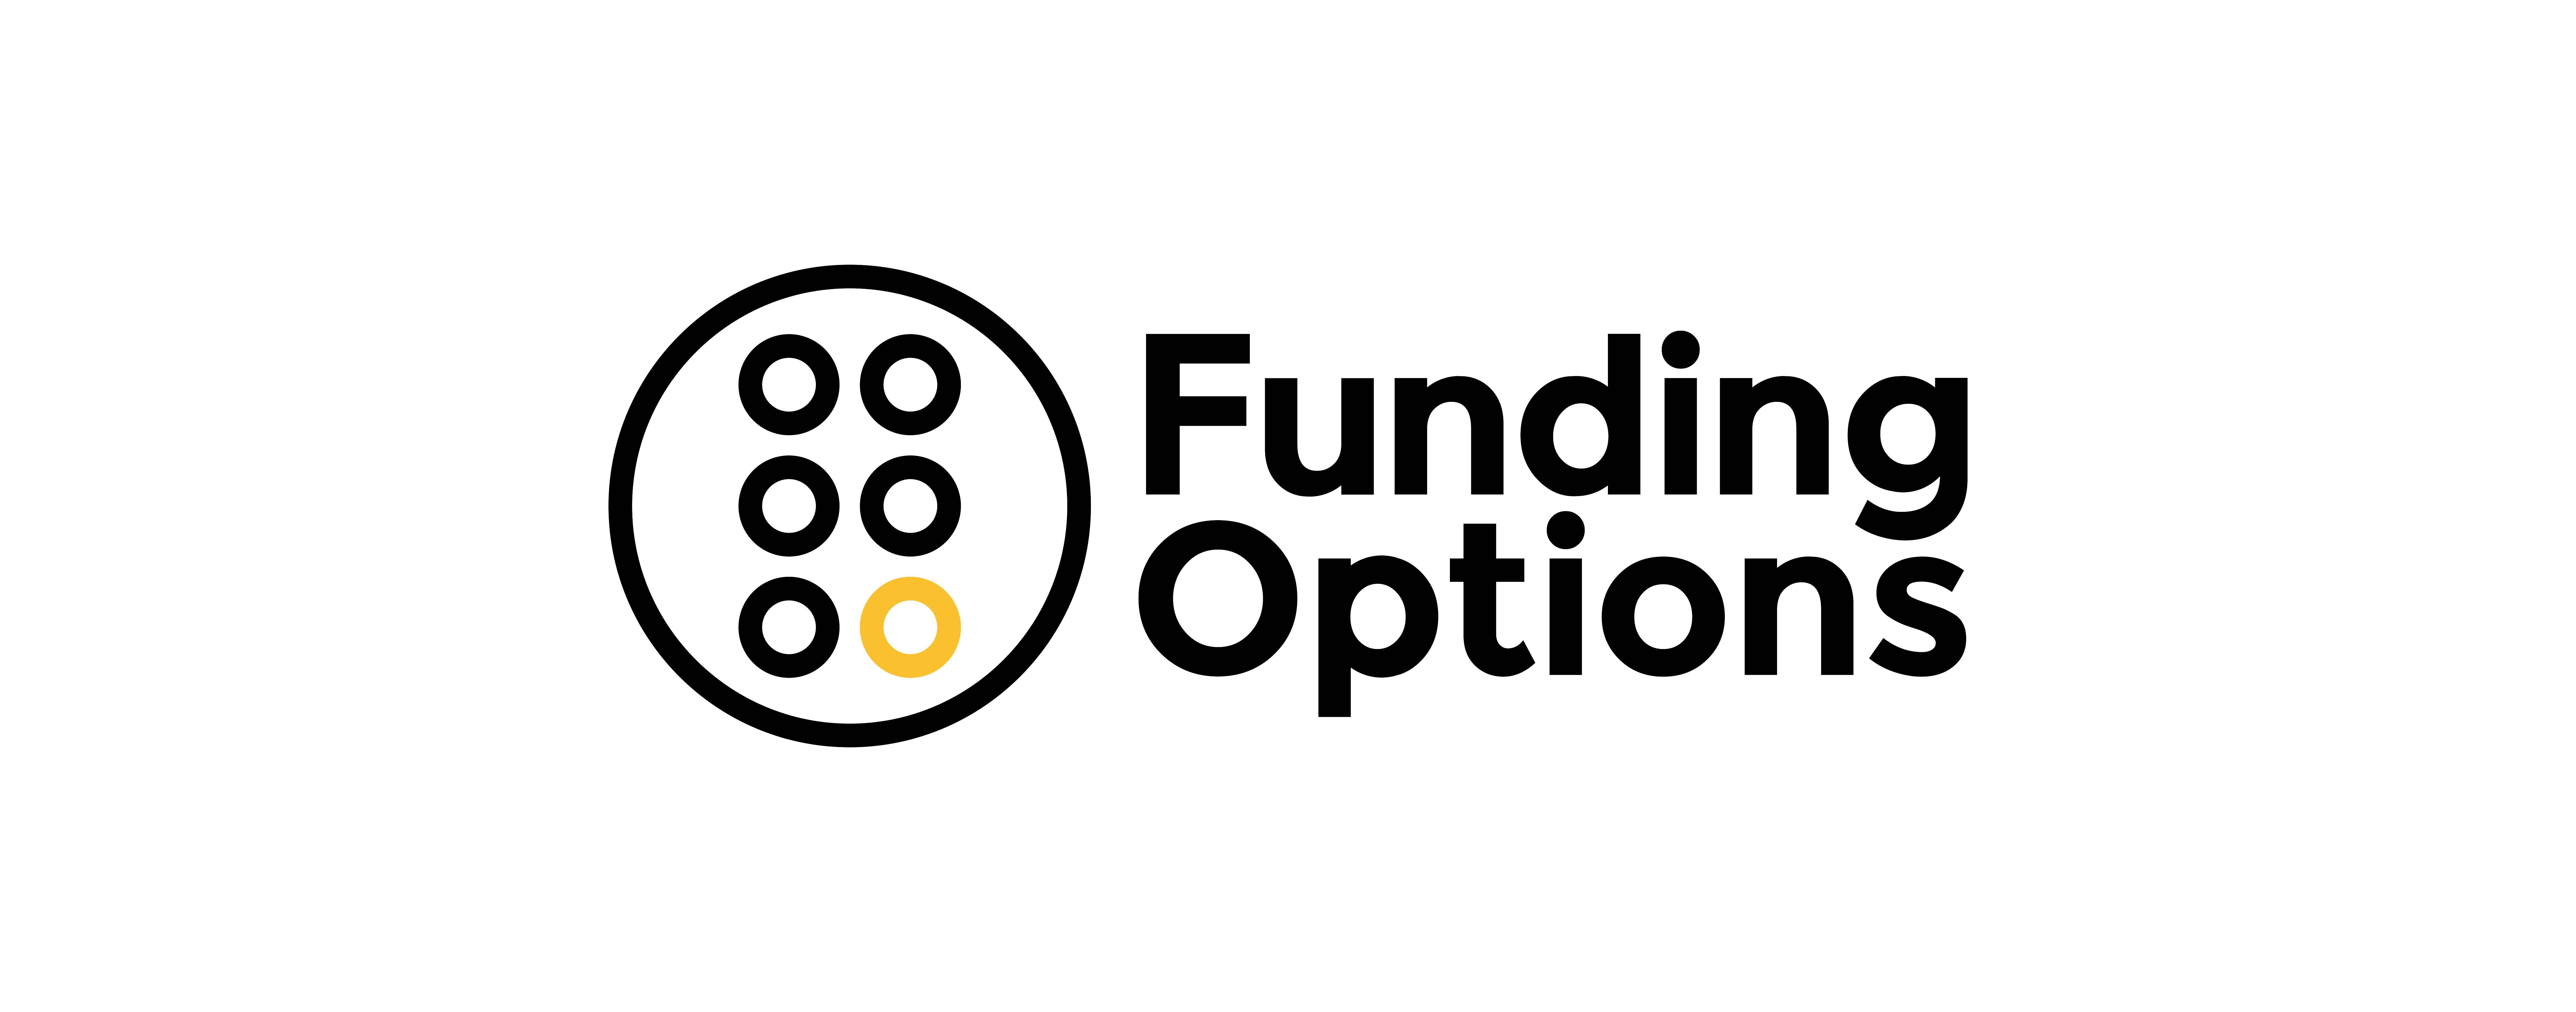 Funding Options Joins SME Finance Forum Global Membership Network